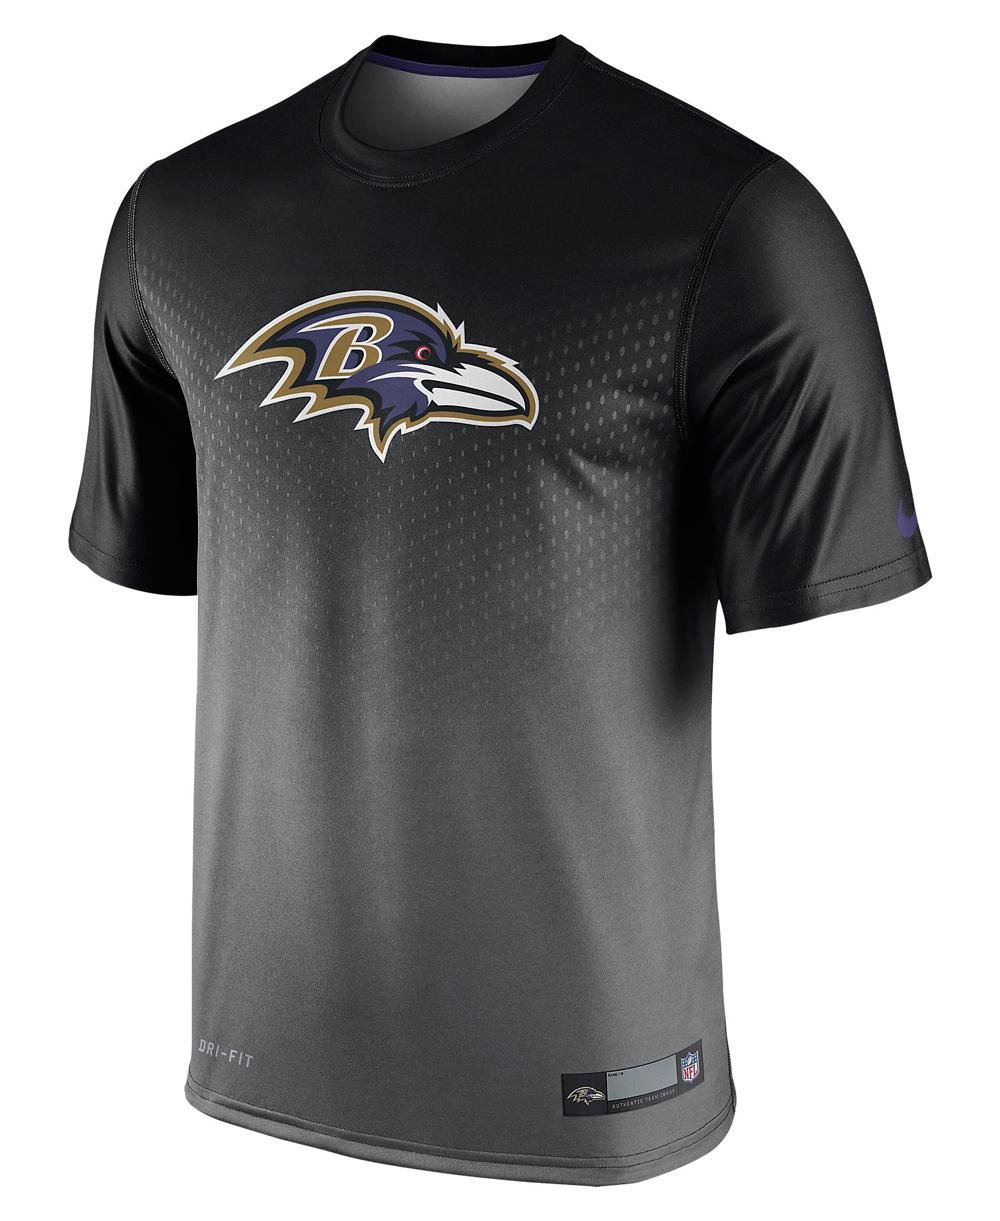 Herren Kurzarm T-Shirt Legend Sideline NFL Baltimore Ravens